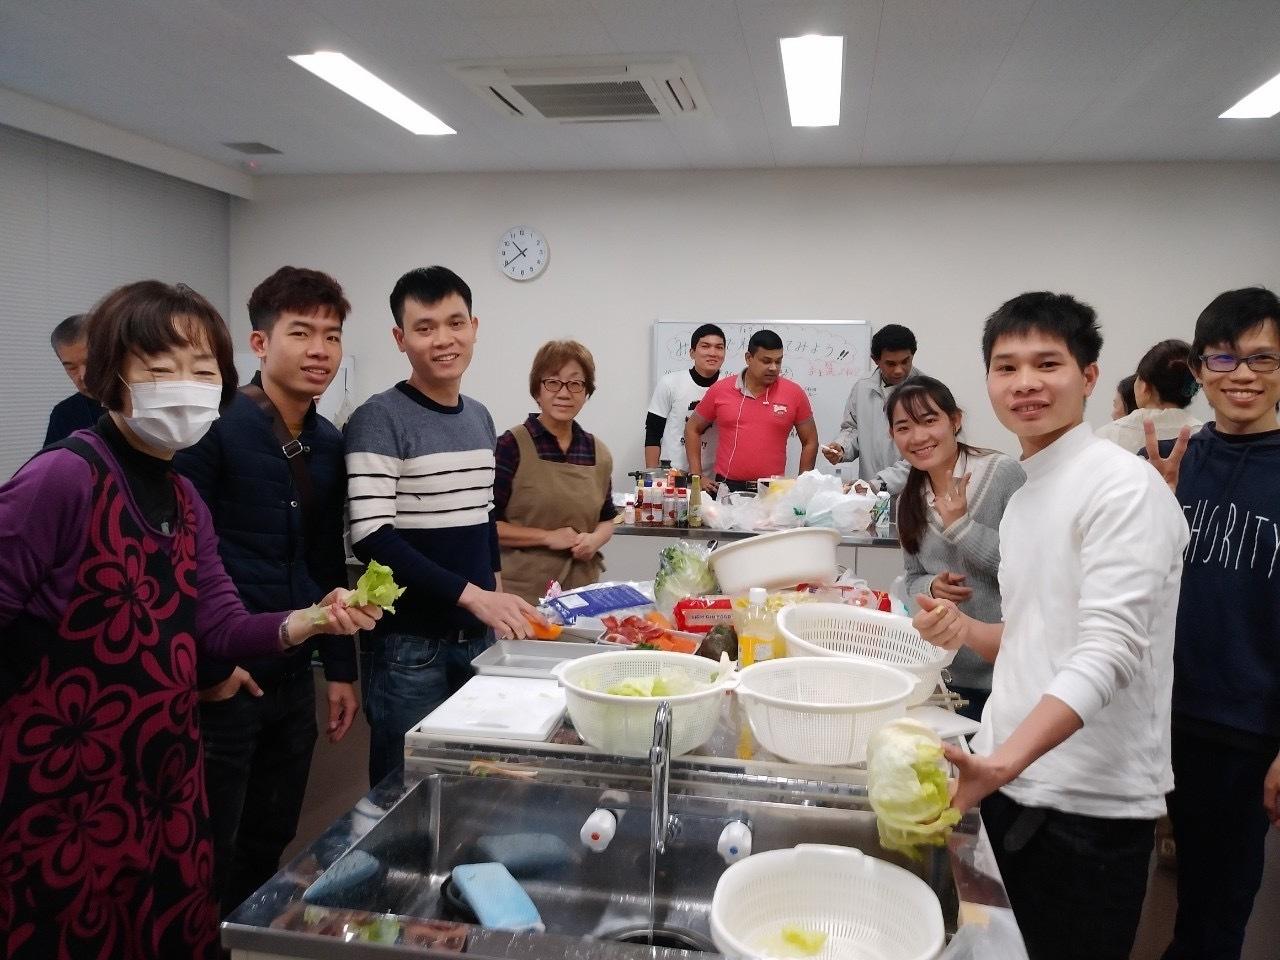 私の国の料理ー火曜夜教室_e0175020_15533721.jpg